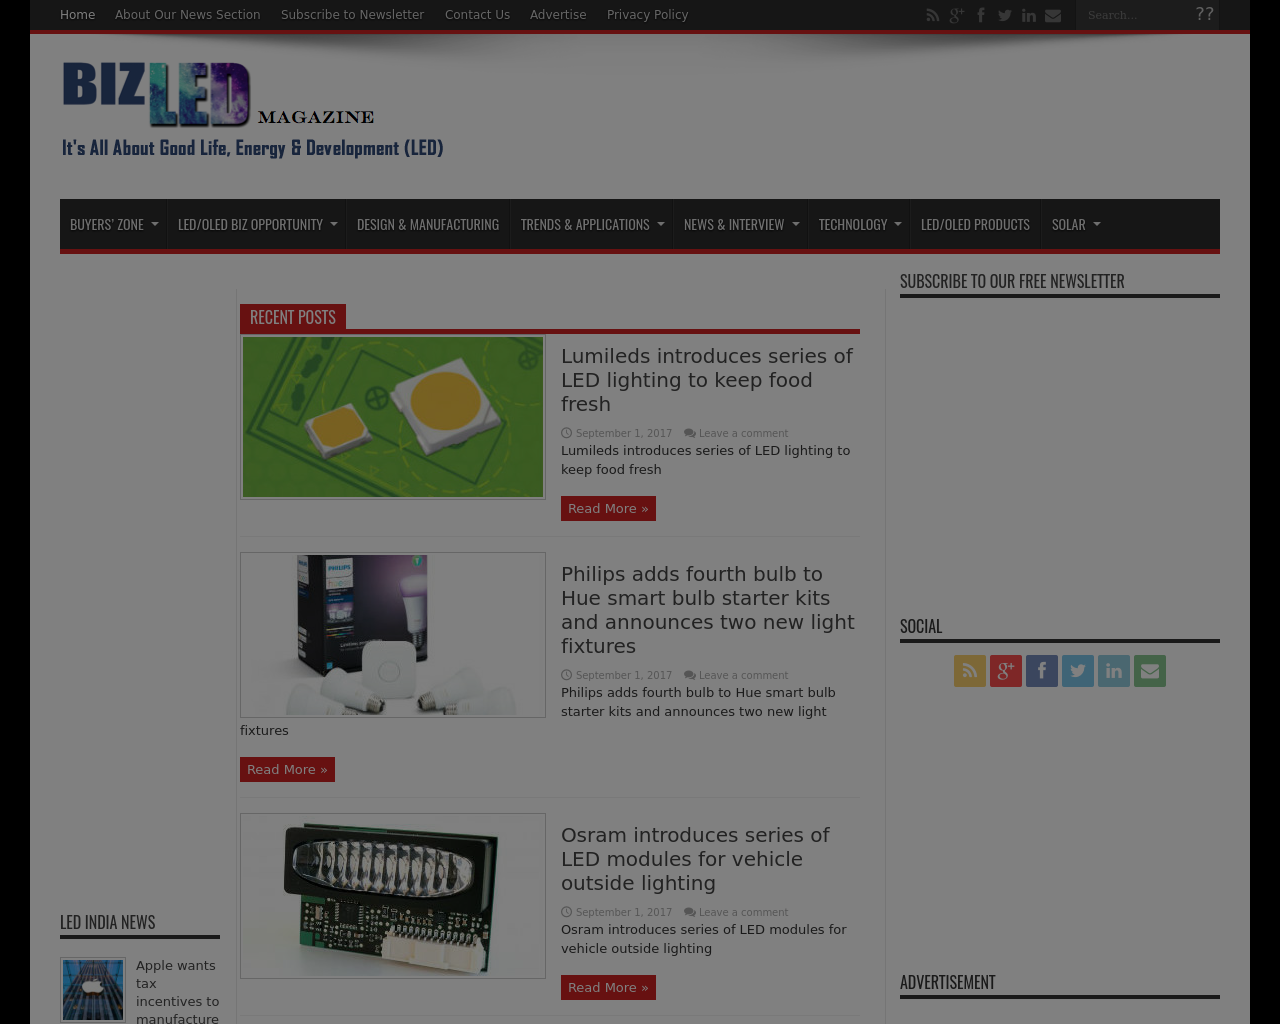 bizLED-Advertising-Reviews-Pricing